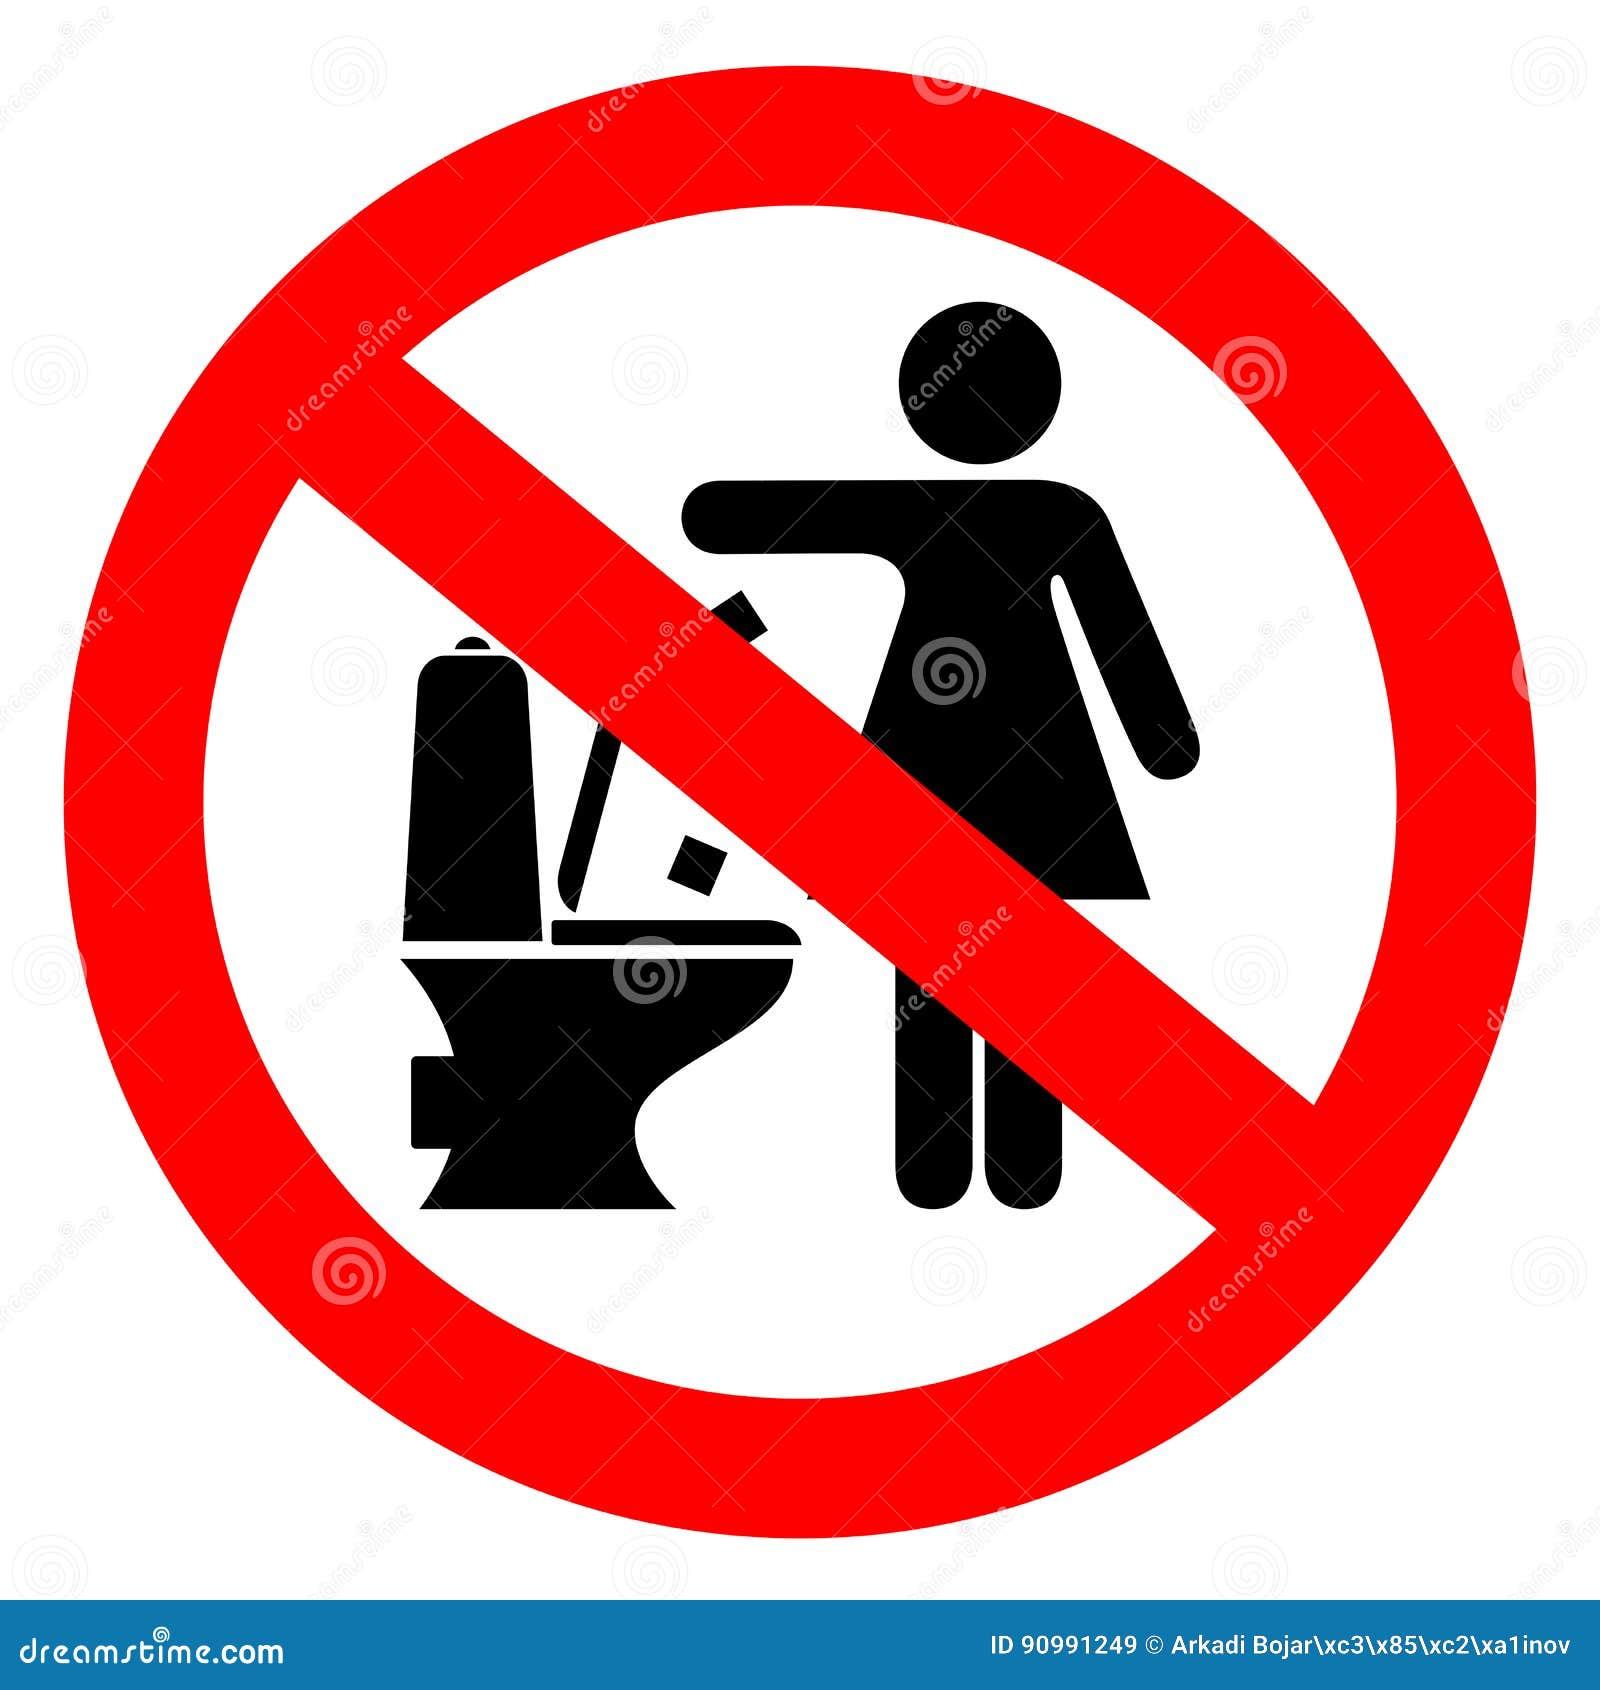 Bathroom Signs Please Do Not Flush bathroom signs do not flush feminine products